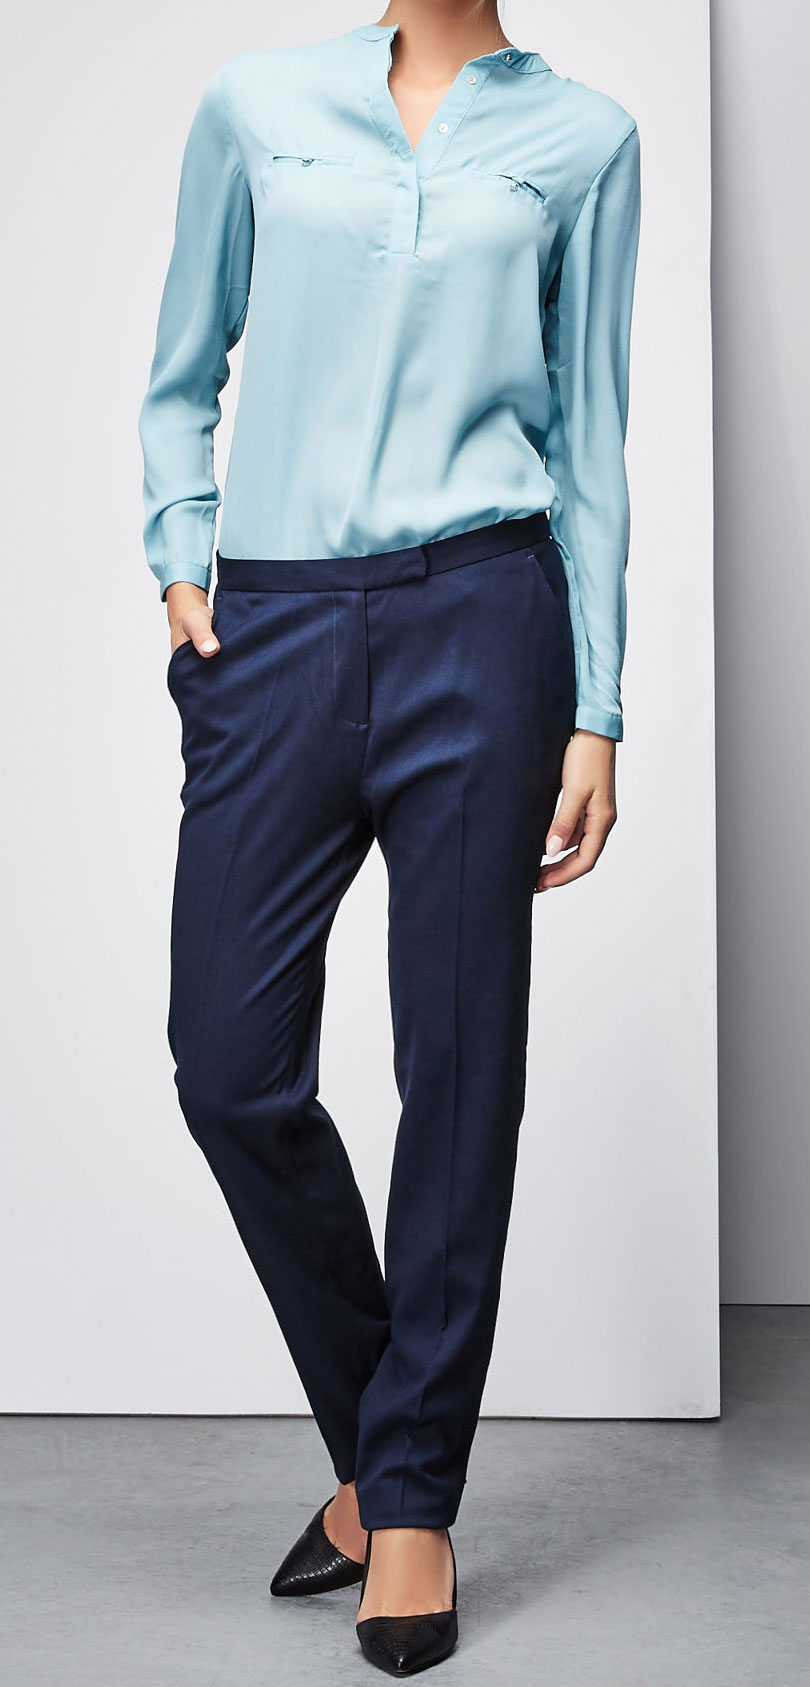 цена  Блузка Moodo, цвет: голубой. Z-KO-1811. Размер S (44)  онлайн в 2017 году